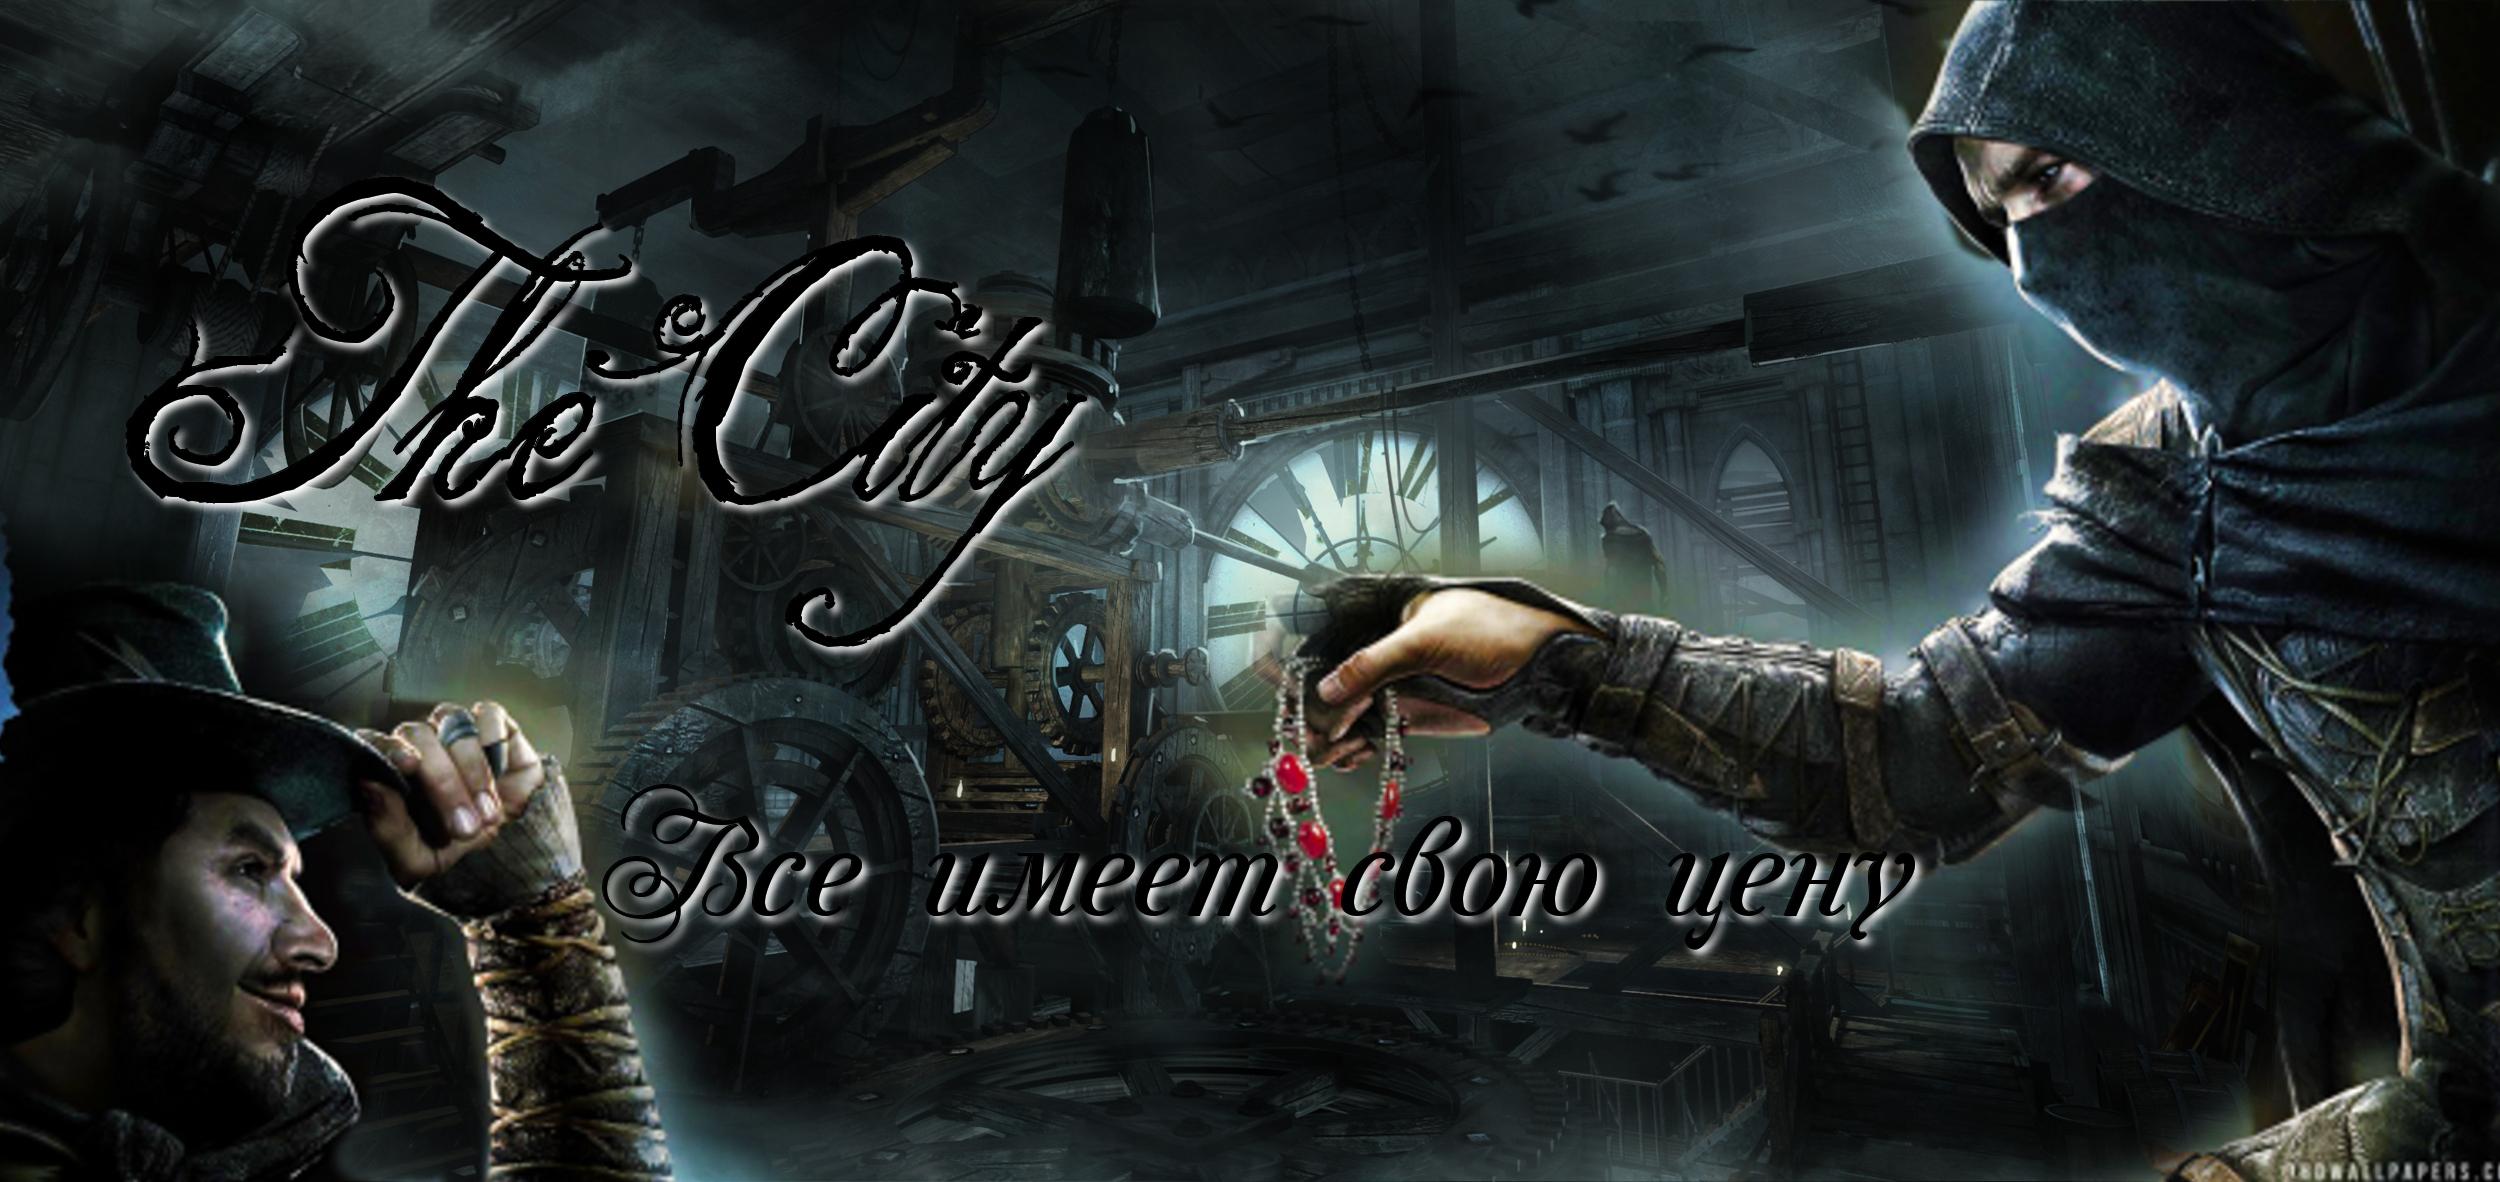 http://s7.uploads.ru/YrkuH.jpg